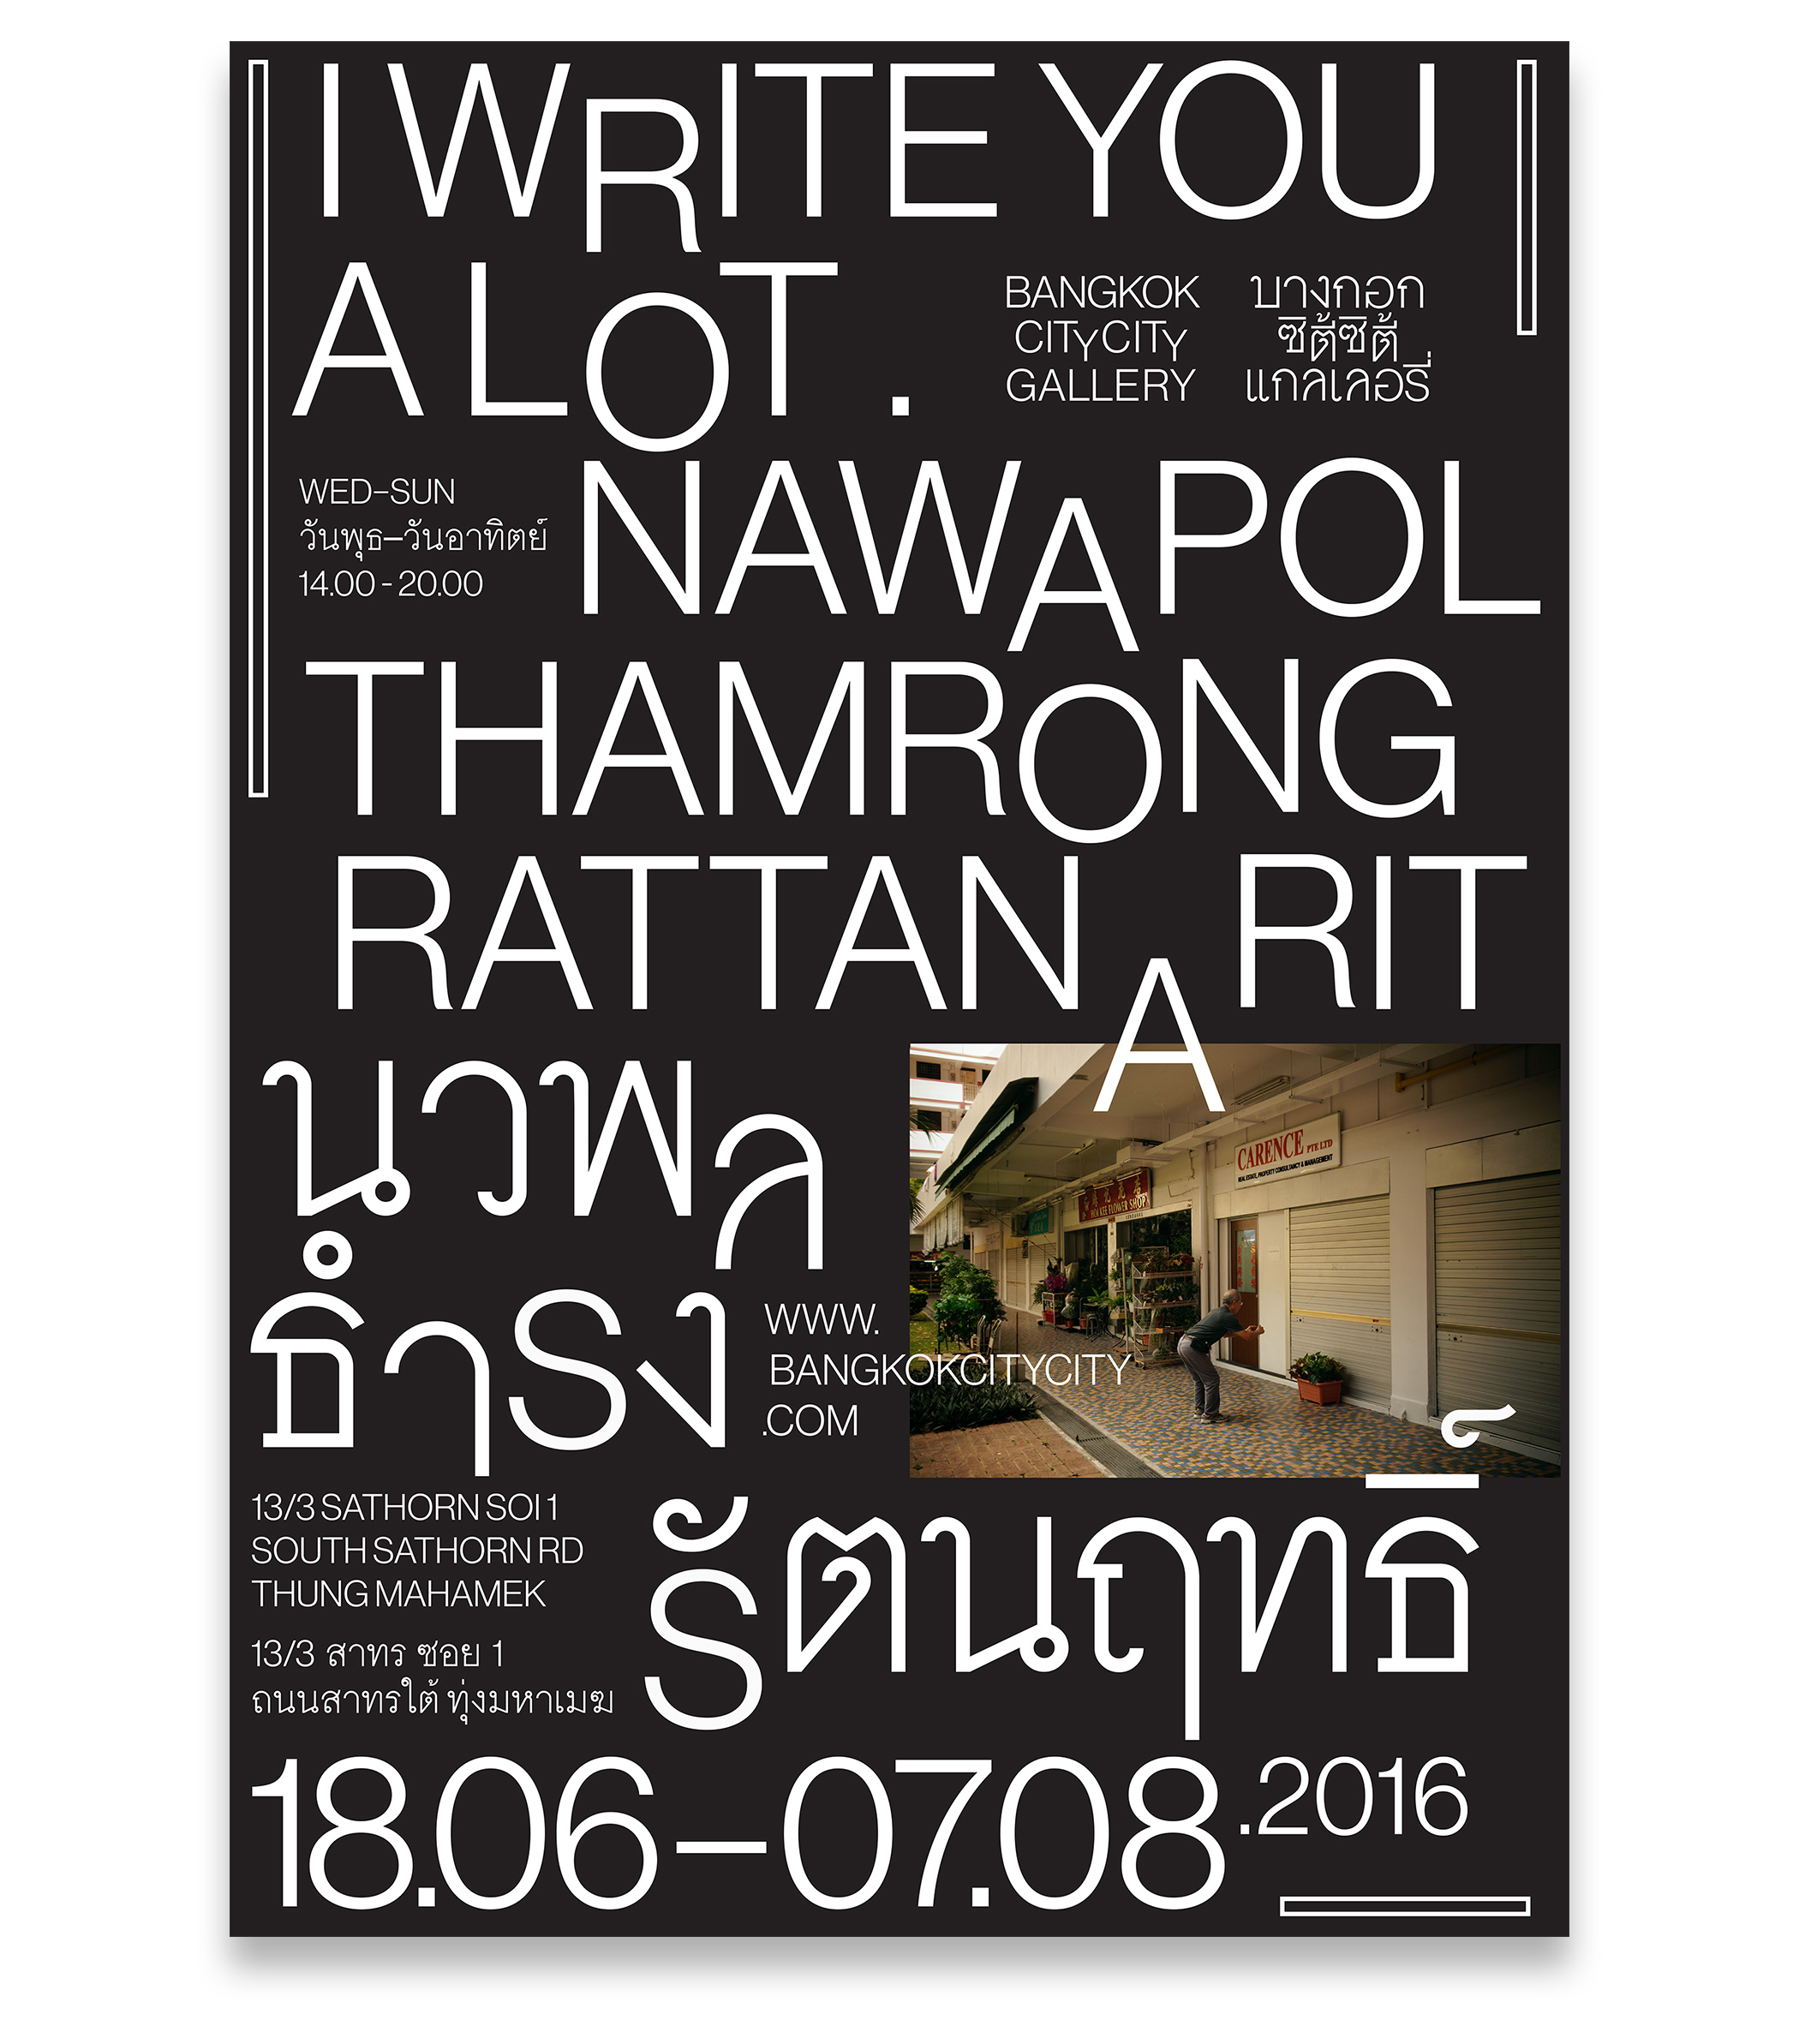 BANGKOK CITYCITY GALLERY poster design